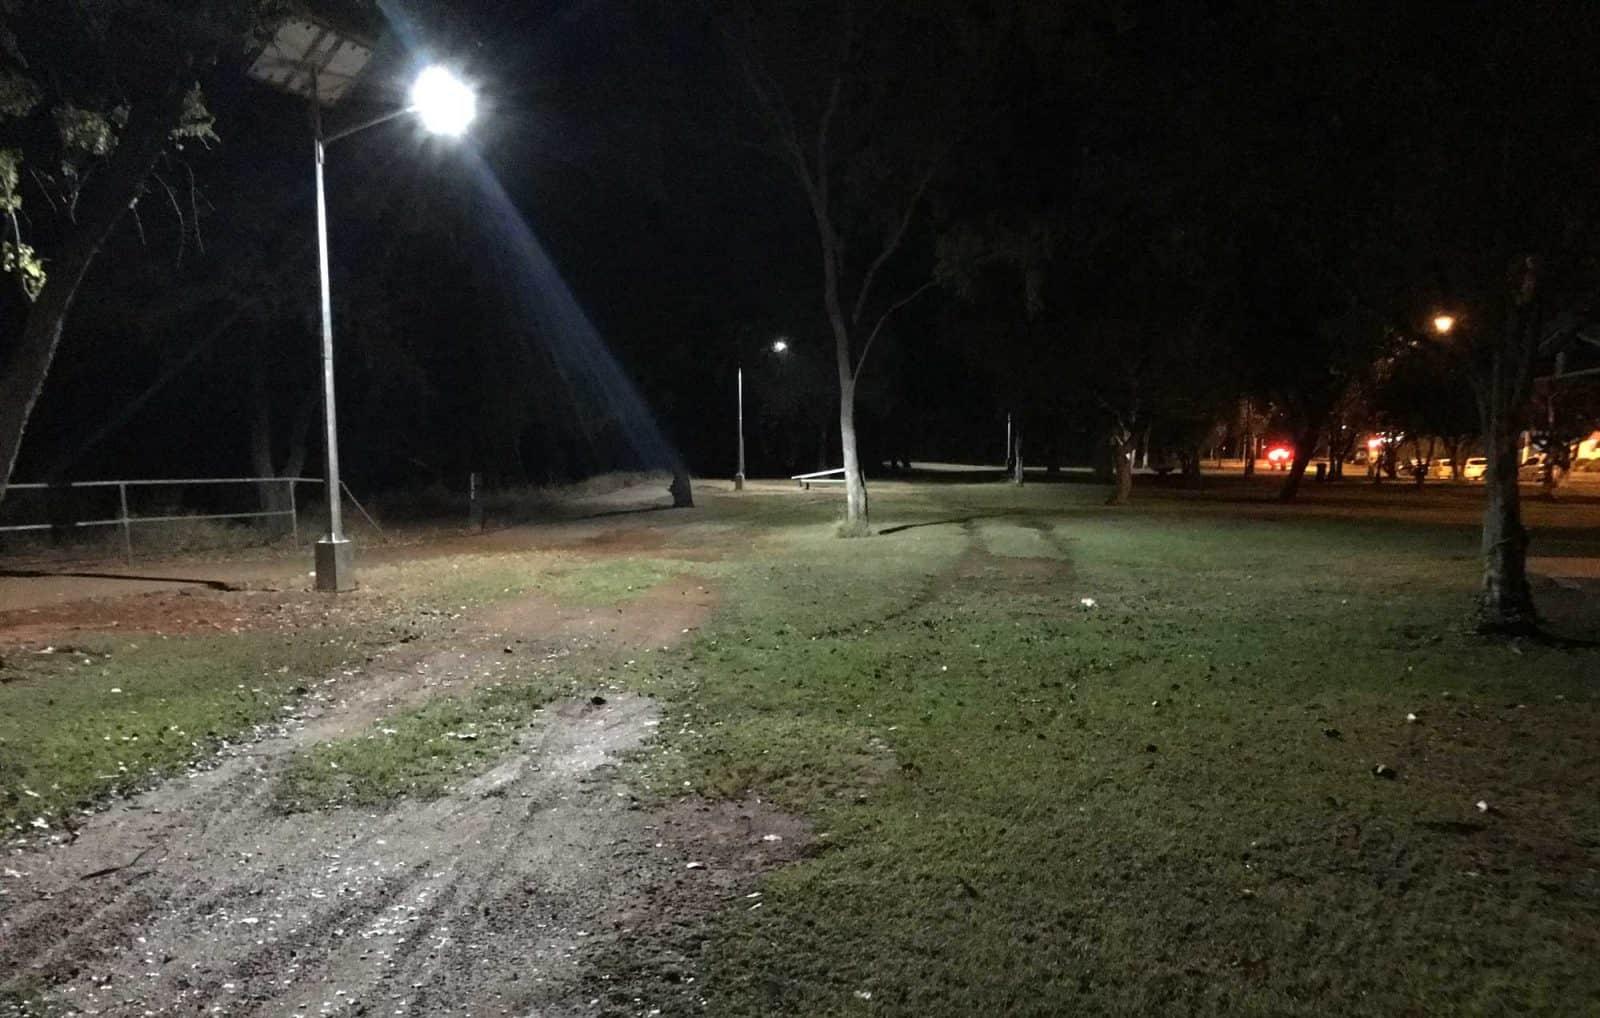 solar street light in Katherine Parklands